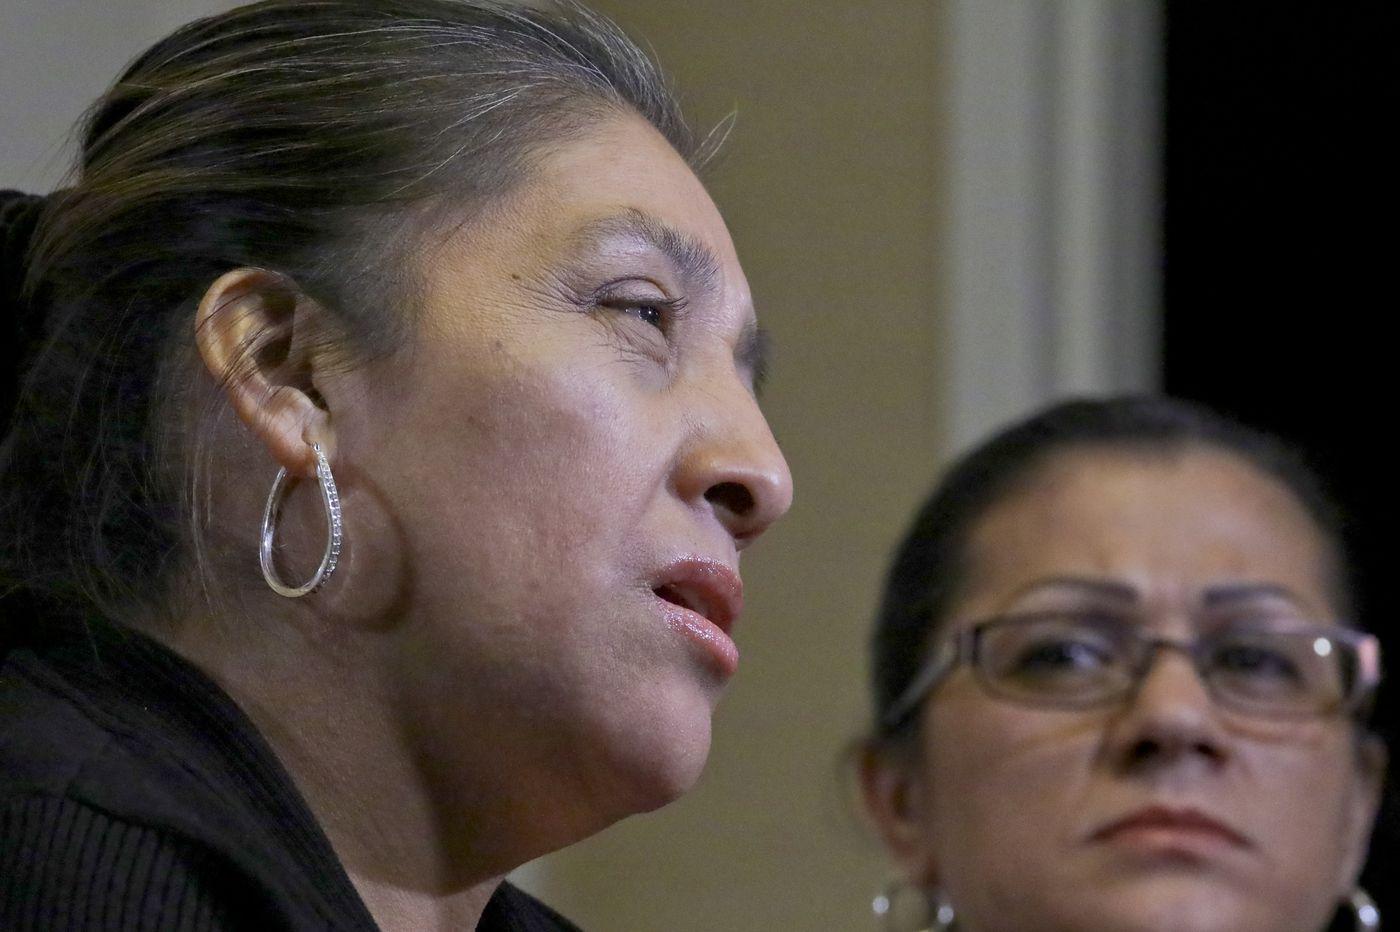 Democratic Representative Will Bring Former Trump Worker To SOTU